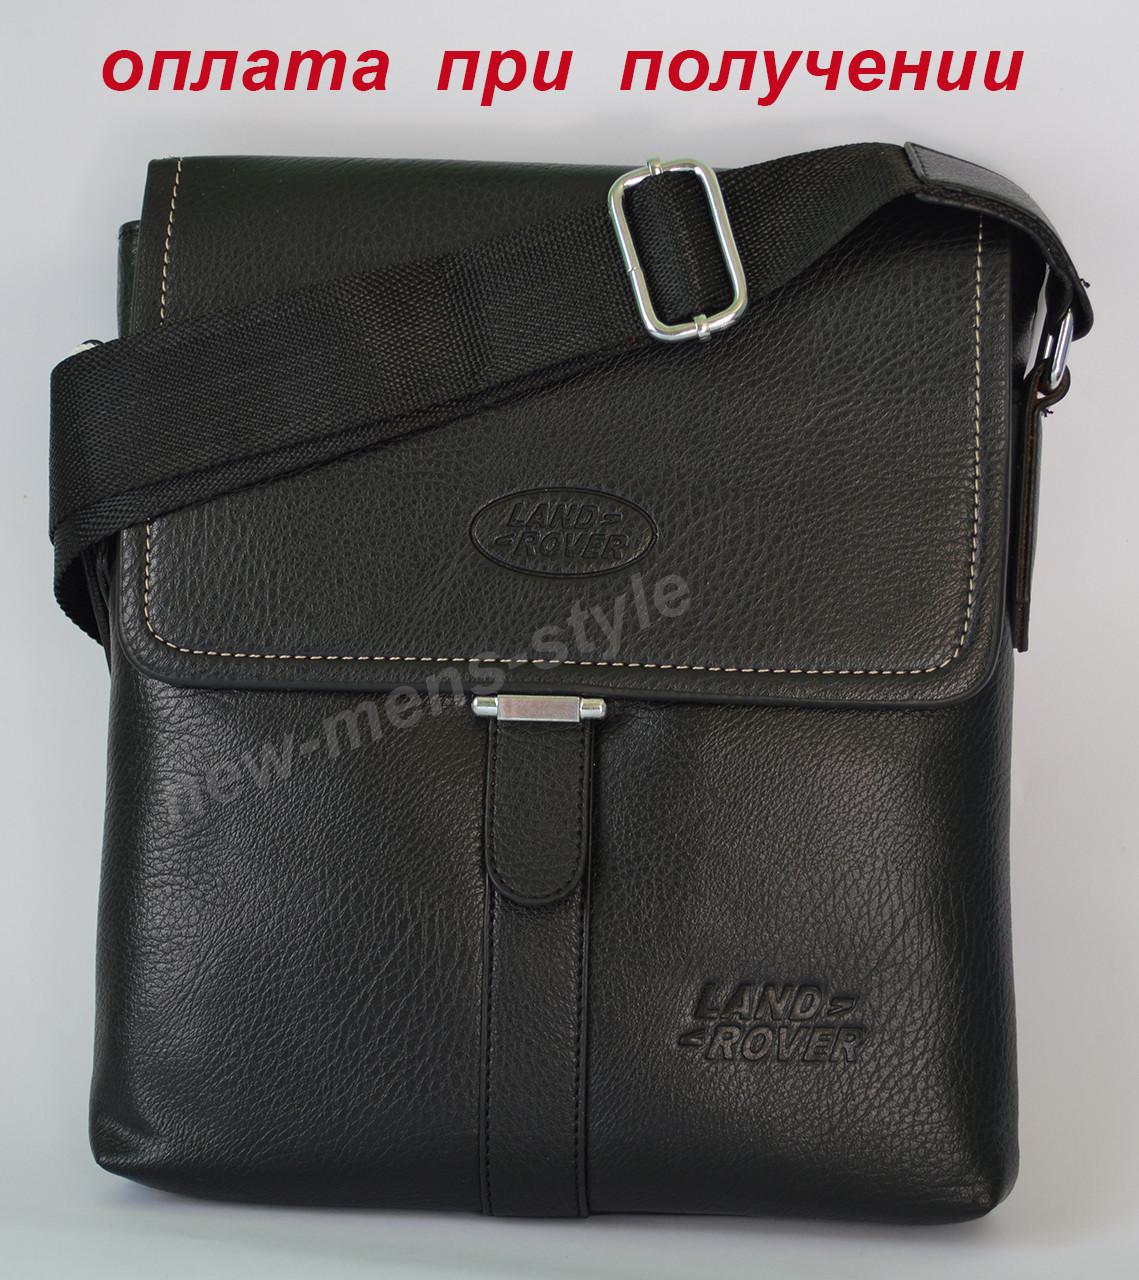 Мужская кожаная фирменная сумка барсетка под Polo, Kangaroo, Jeep (LR)